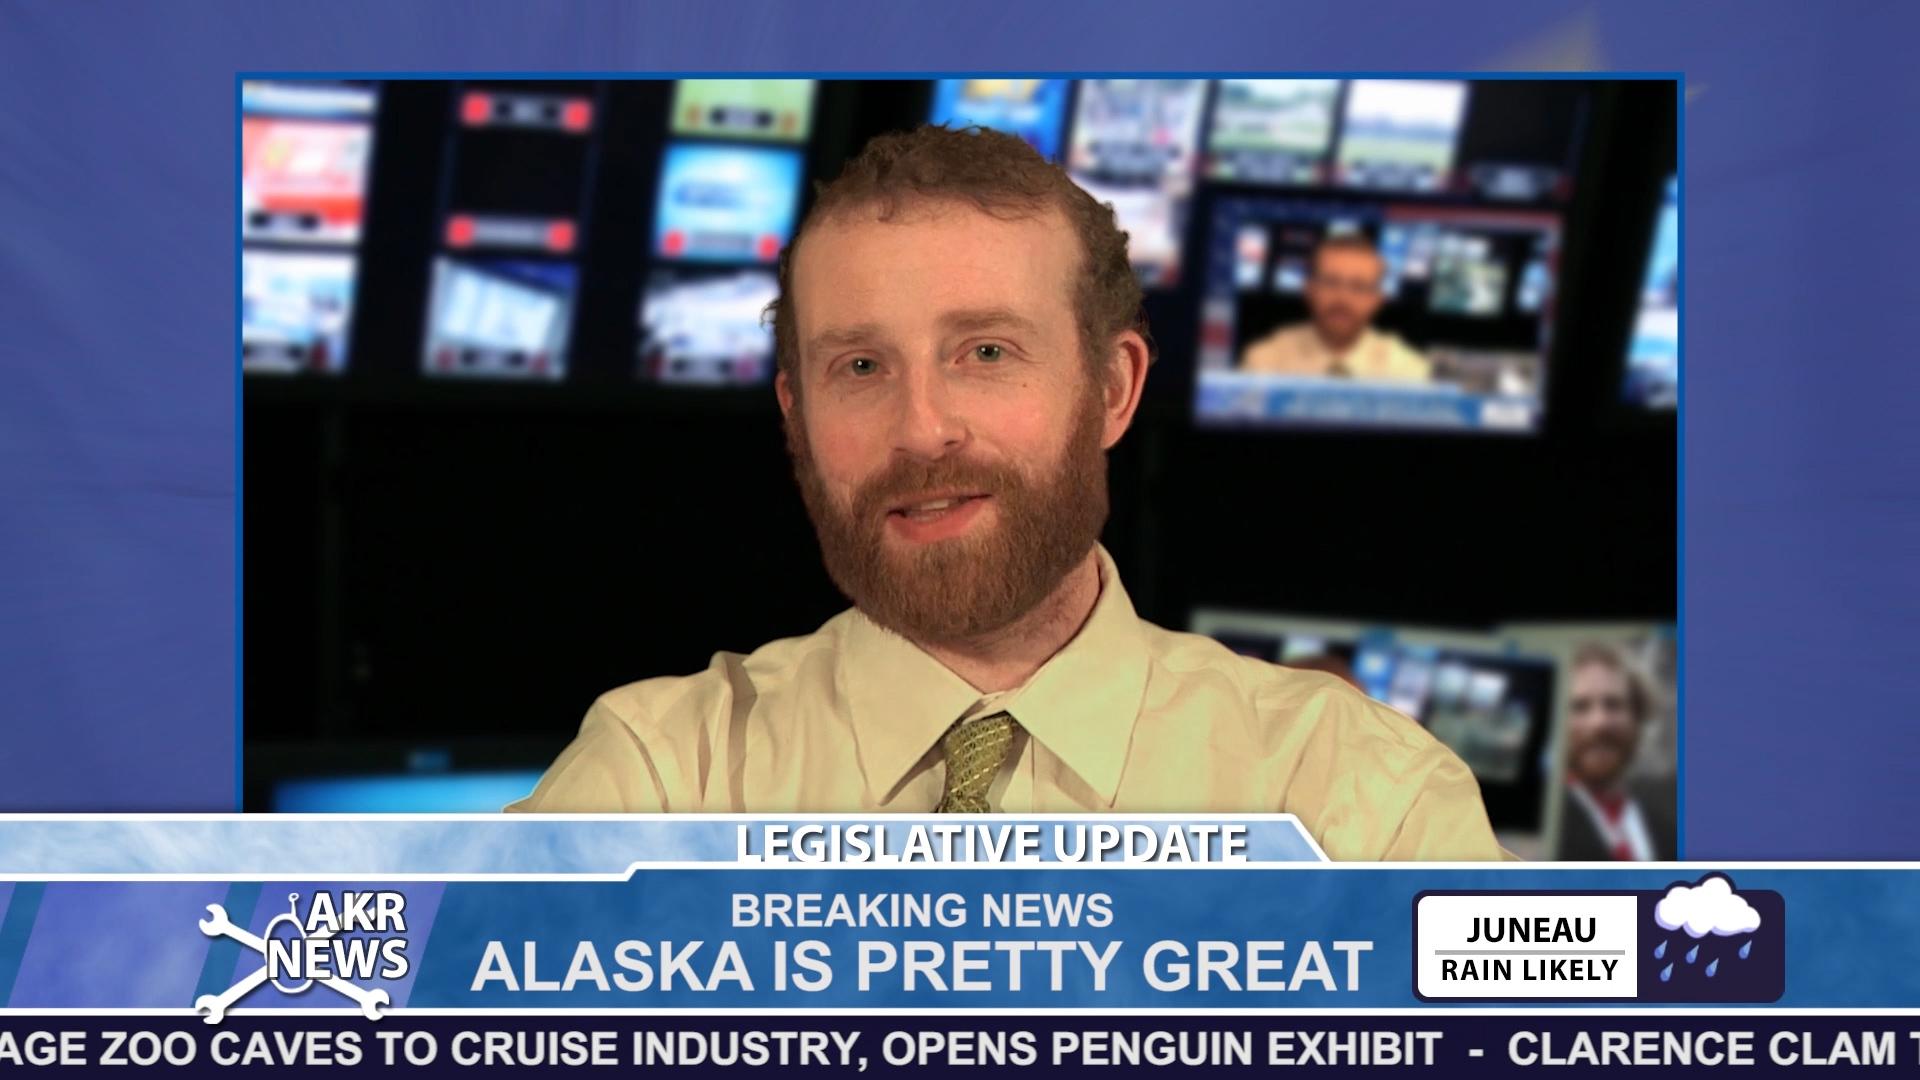 A video still from a 2013 episode of Alaska Robotics News with host Pat Race. (Courtesy of Alaska Robotics)